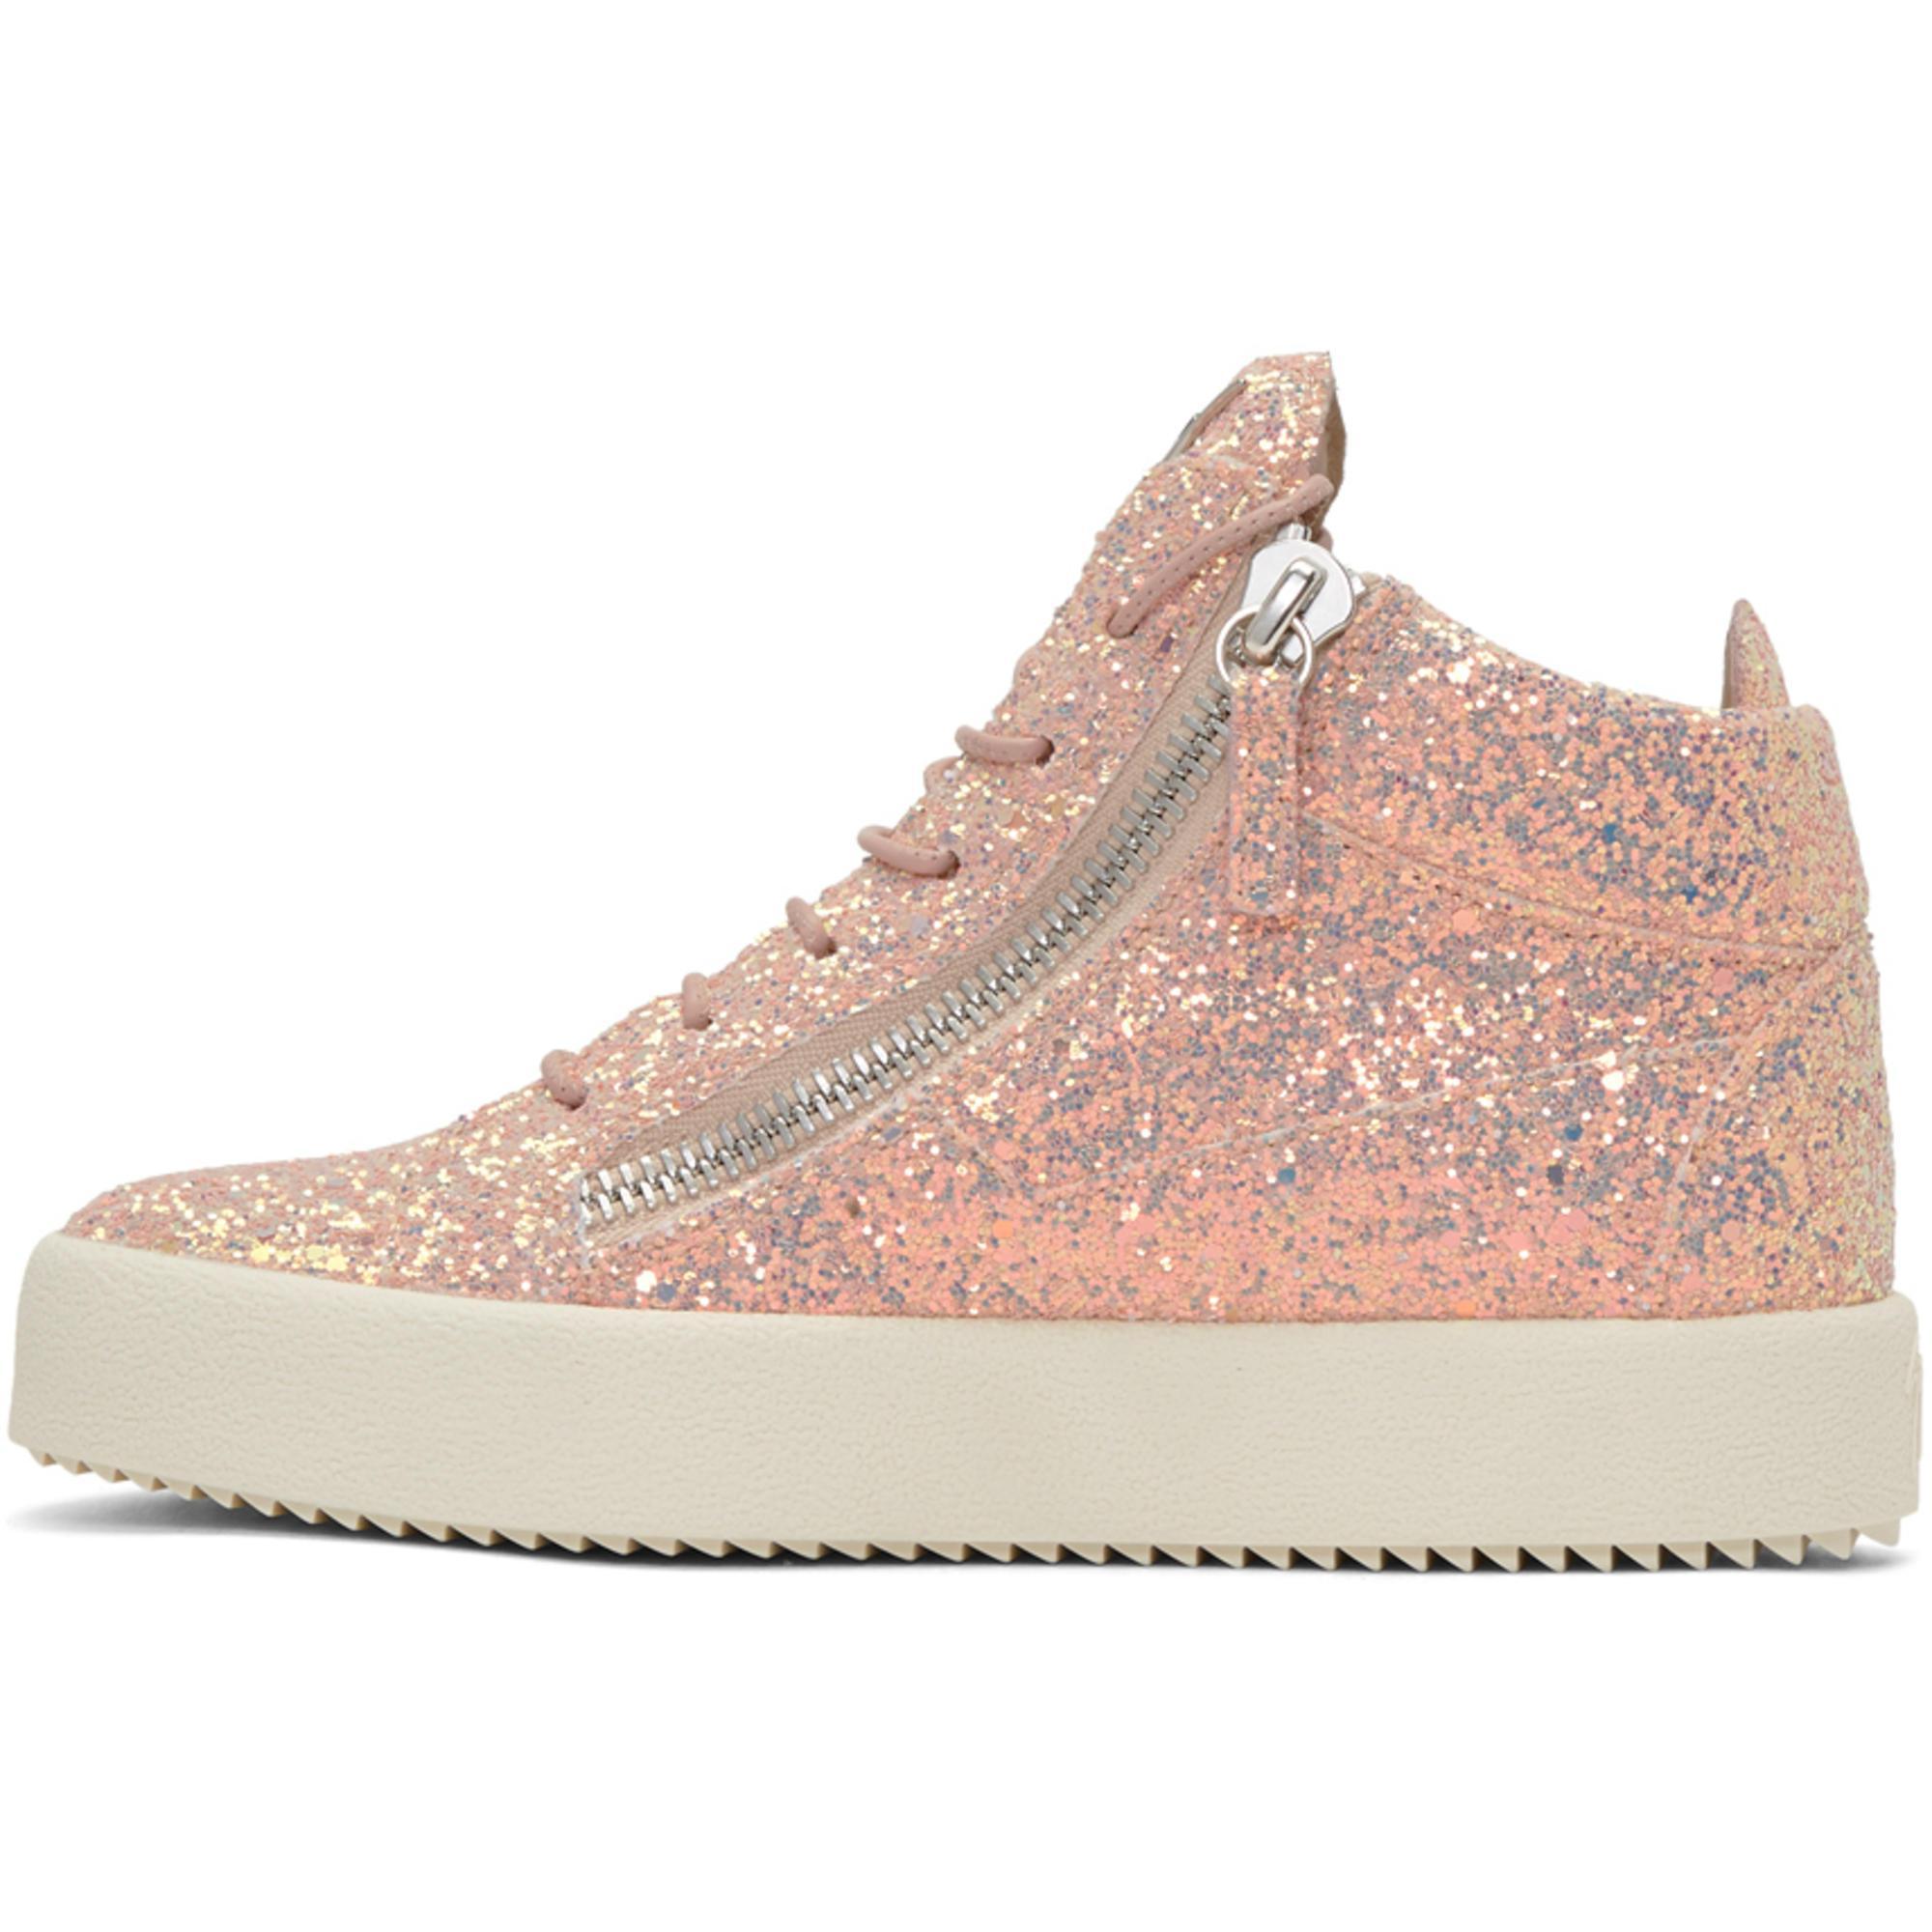 6fc4bff272d86 Giuseppe Zanotti Ssense Exclusive Pink Glitter May London High-top ...